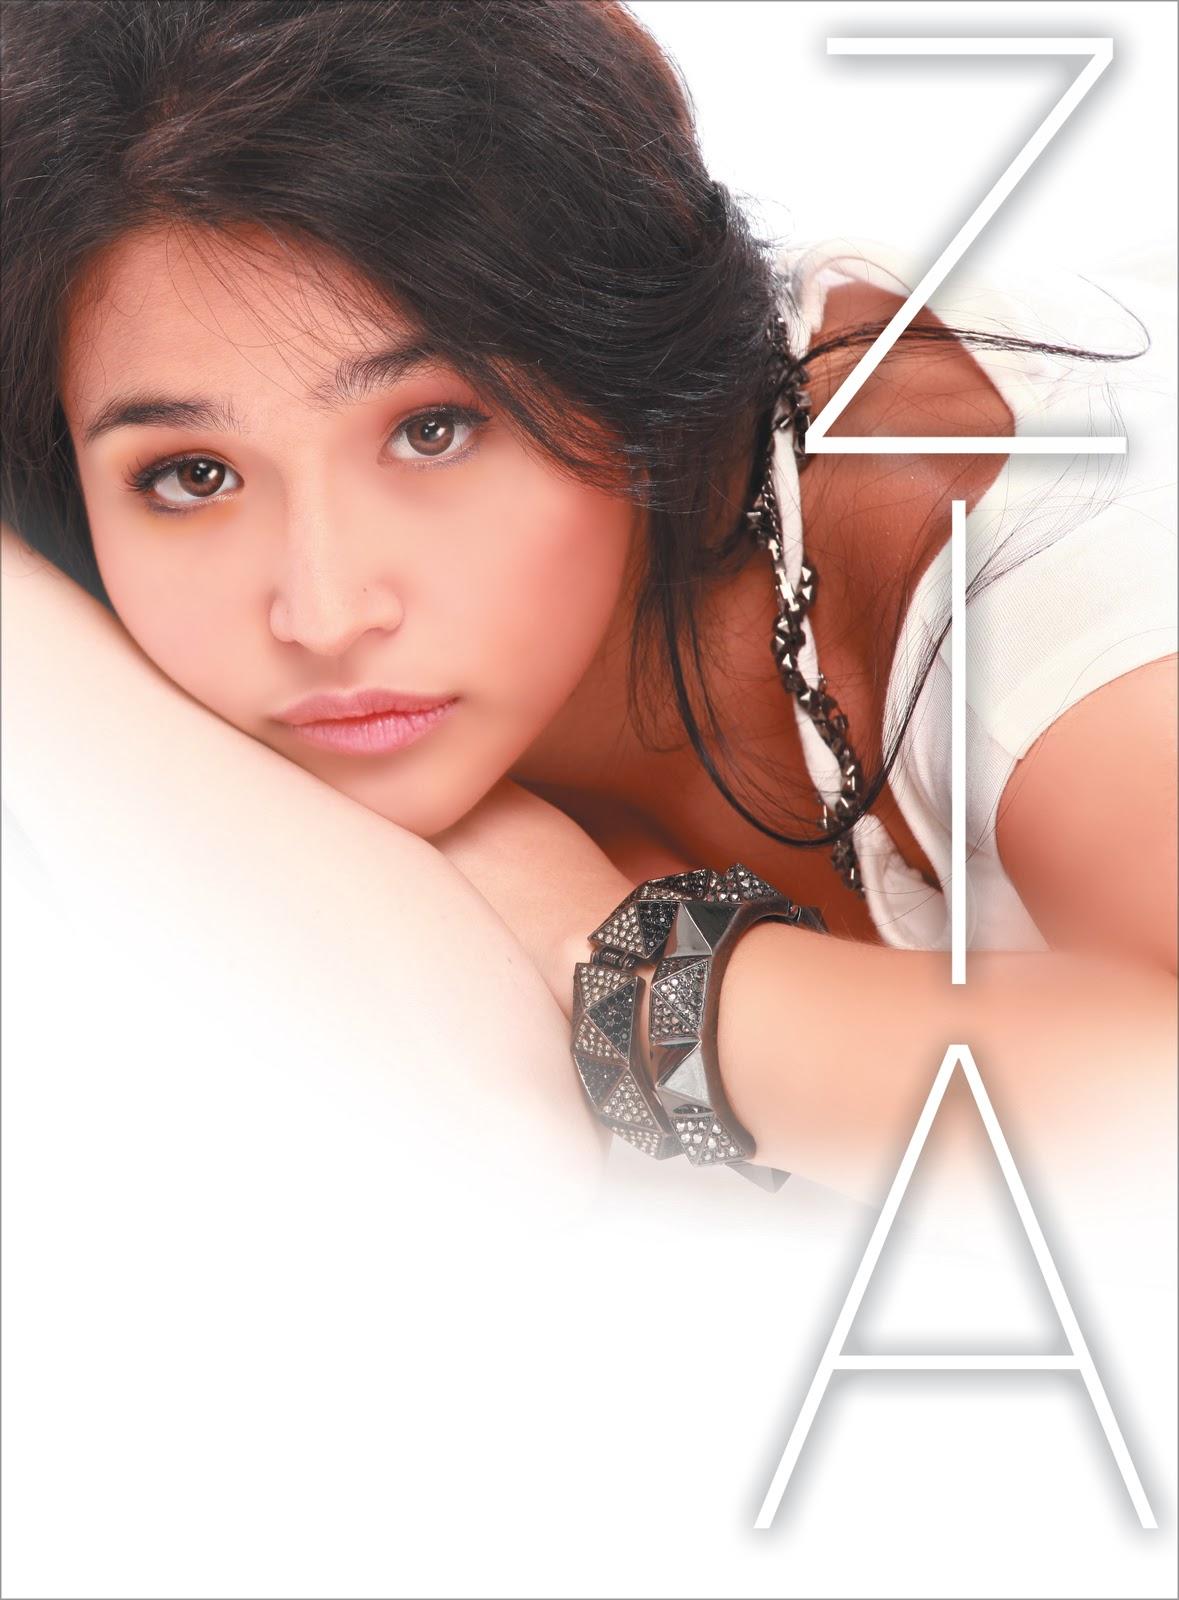 http://1.bp.blogspot.com/-1EkWahTWX14/TpxCMGS85mI/AAAAAAAABSk/_bznV6aDsbI/s1600/ZIA-COVER-FRONt.jpg